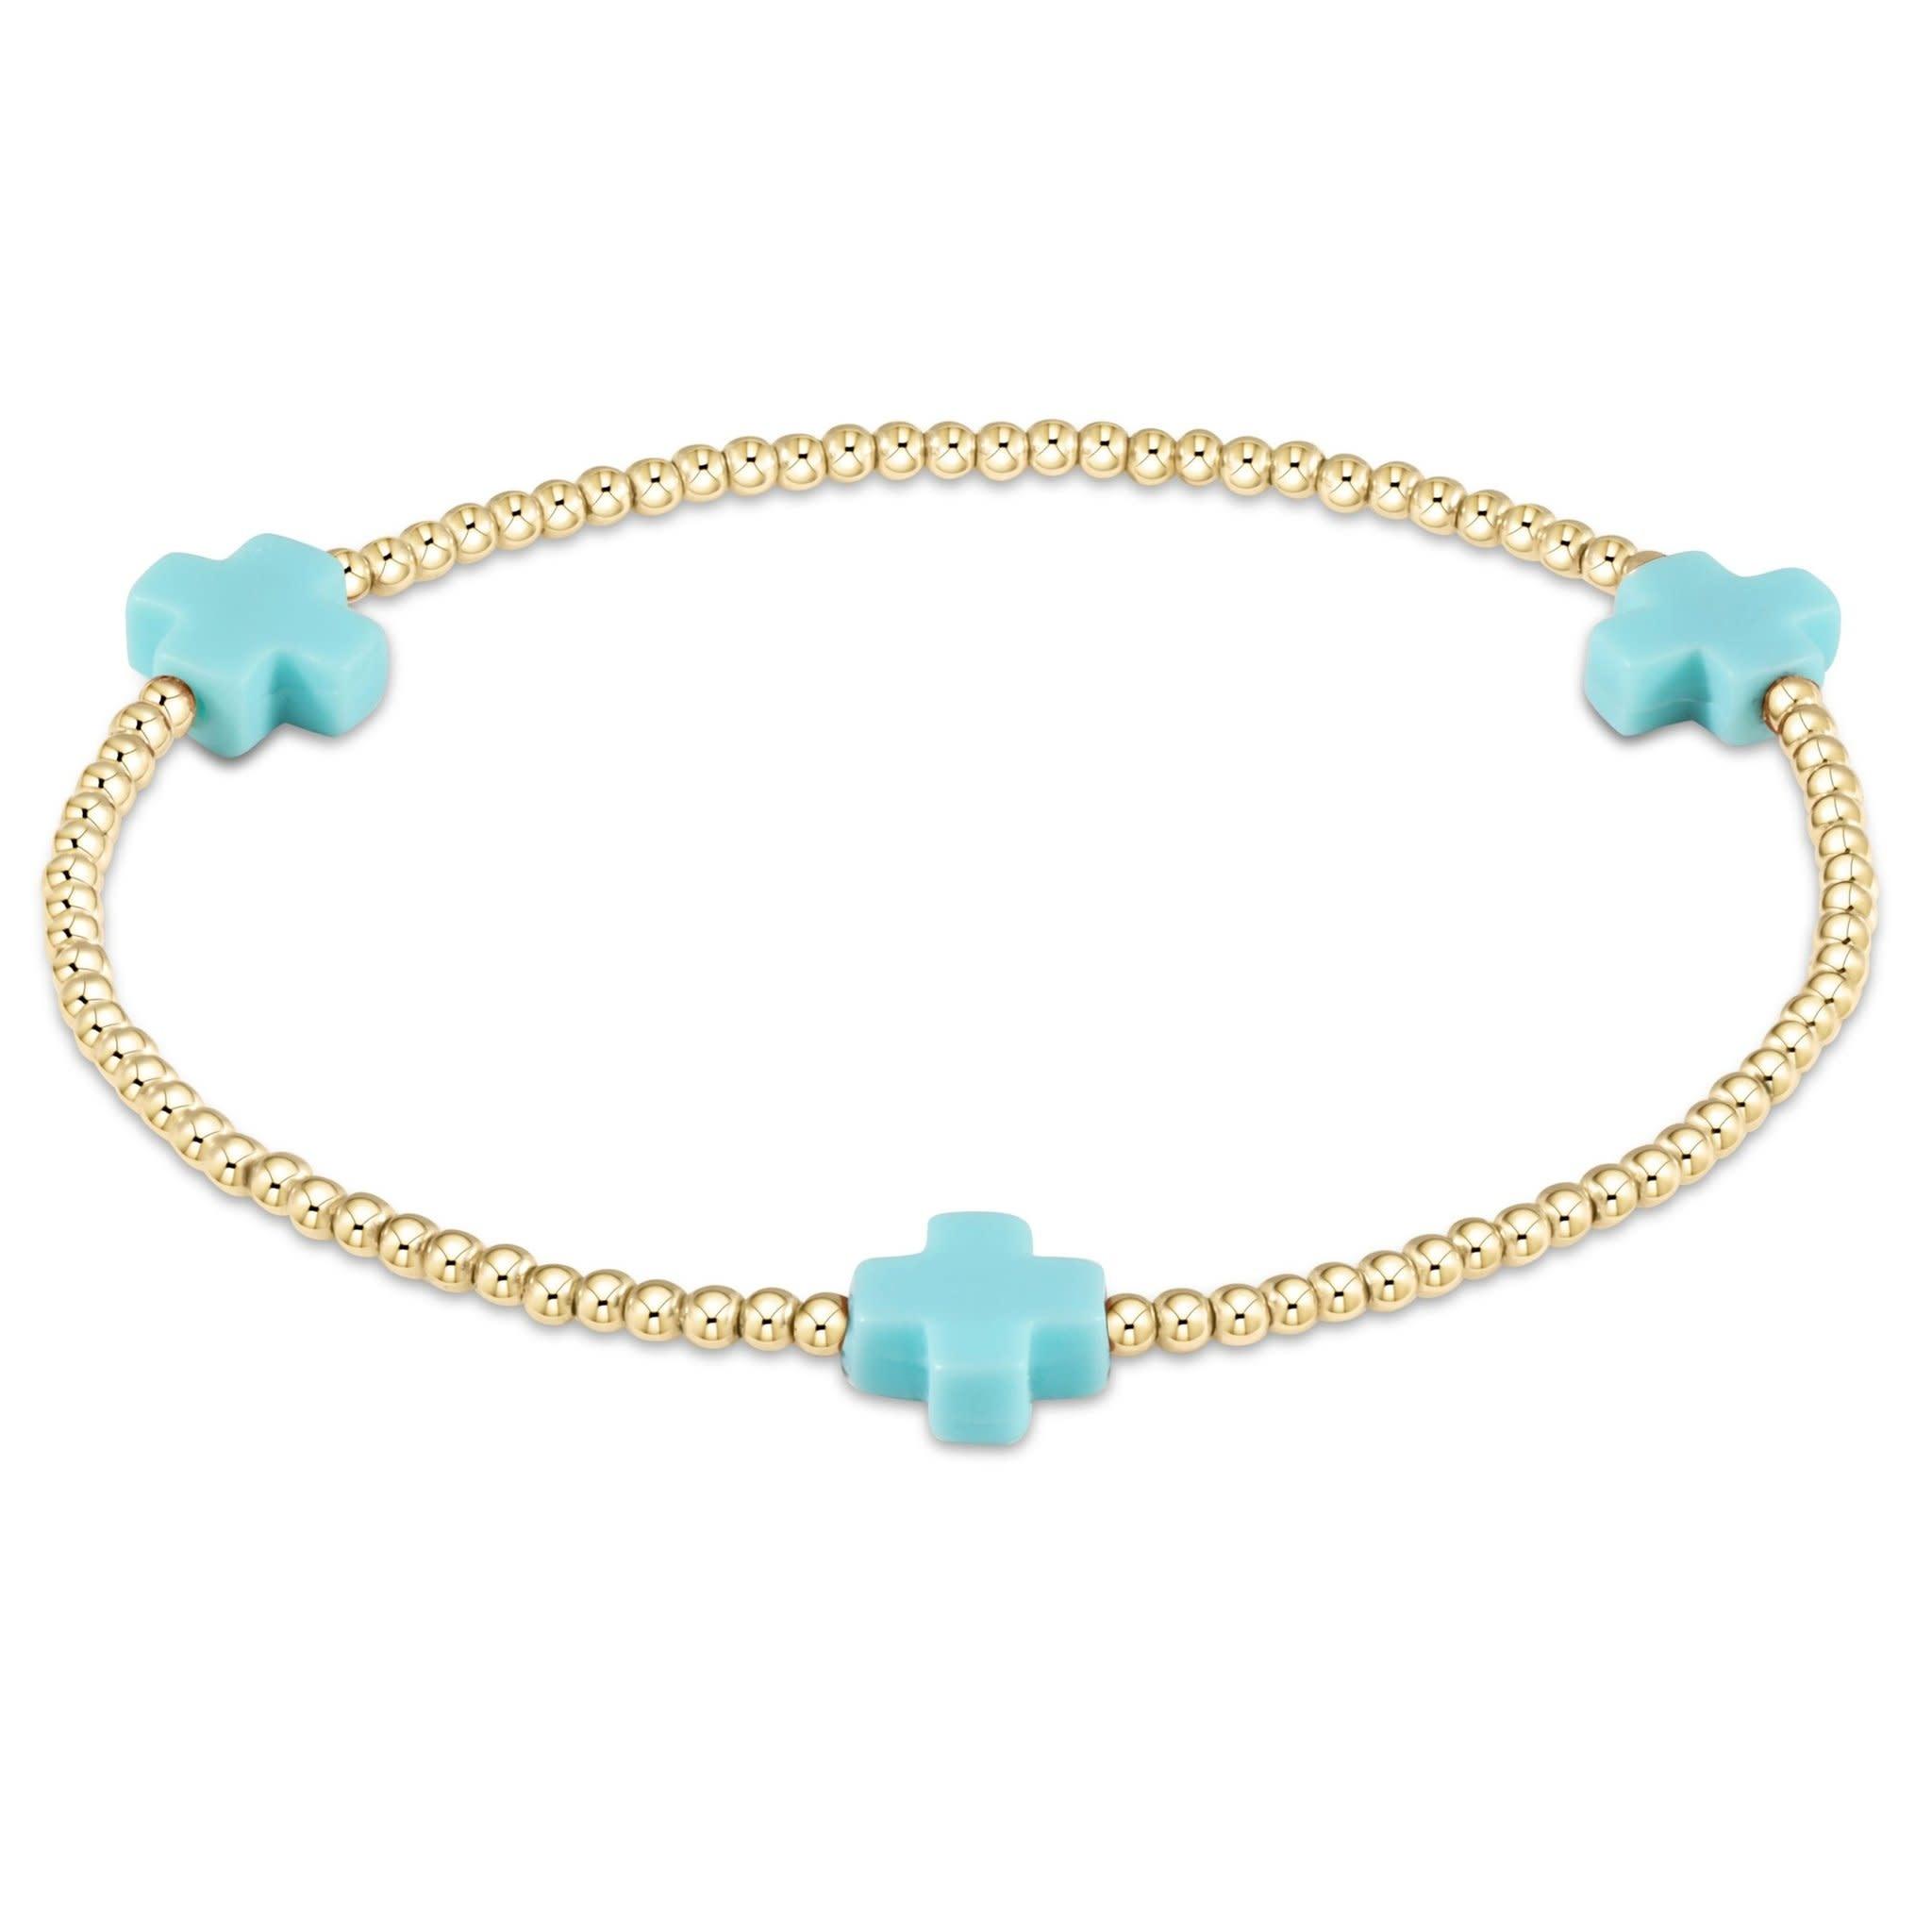 Extends Cross 3mm Turquoise Bracelet